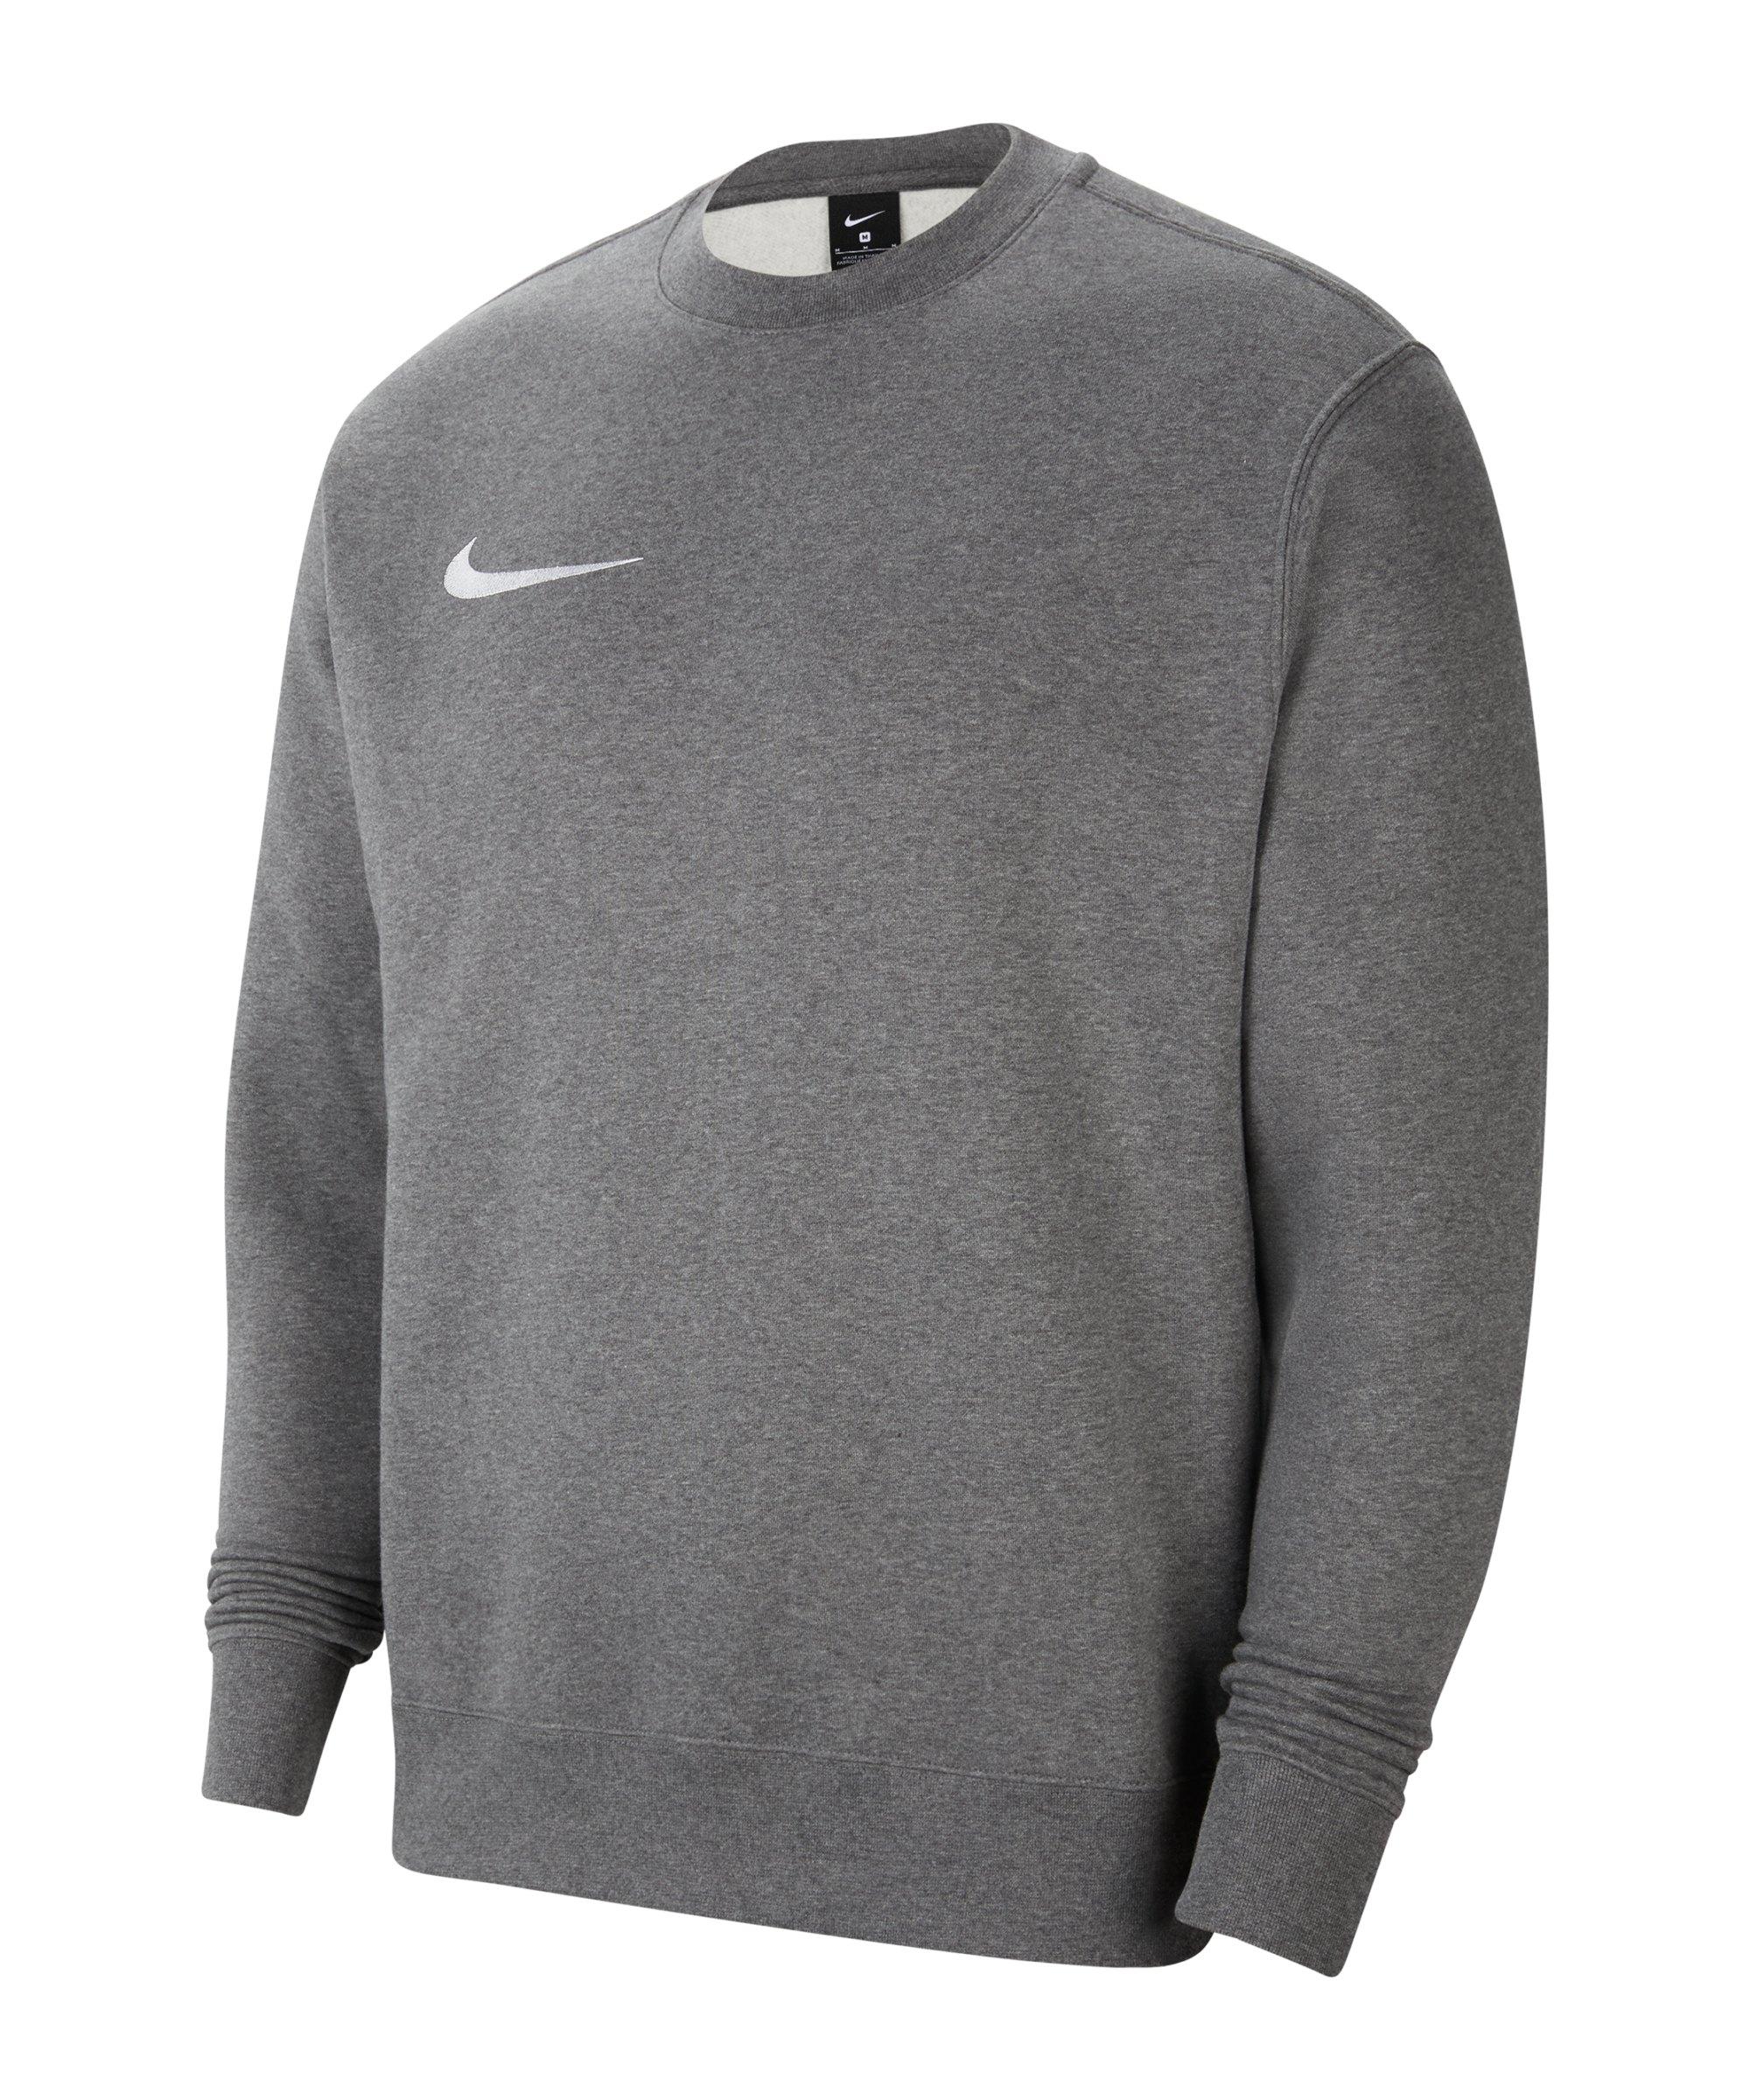 Nike Park 20 Fleece Sweatshirt Grau Weiss F071 - grau